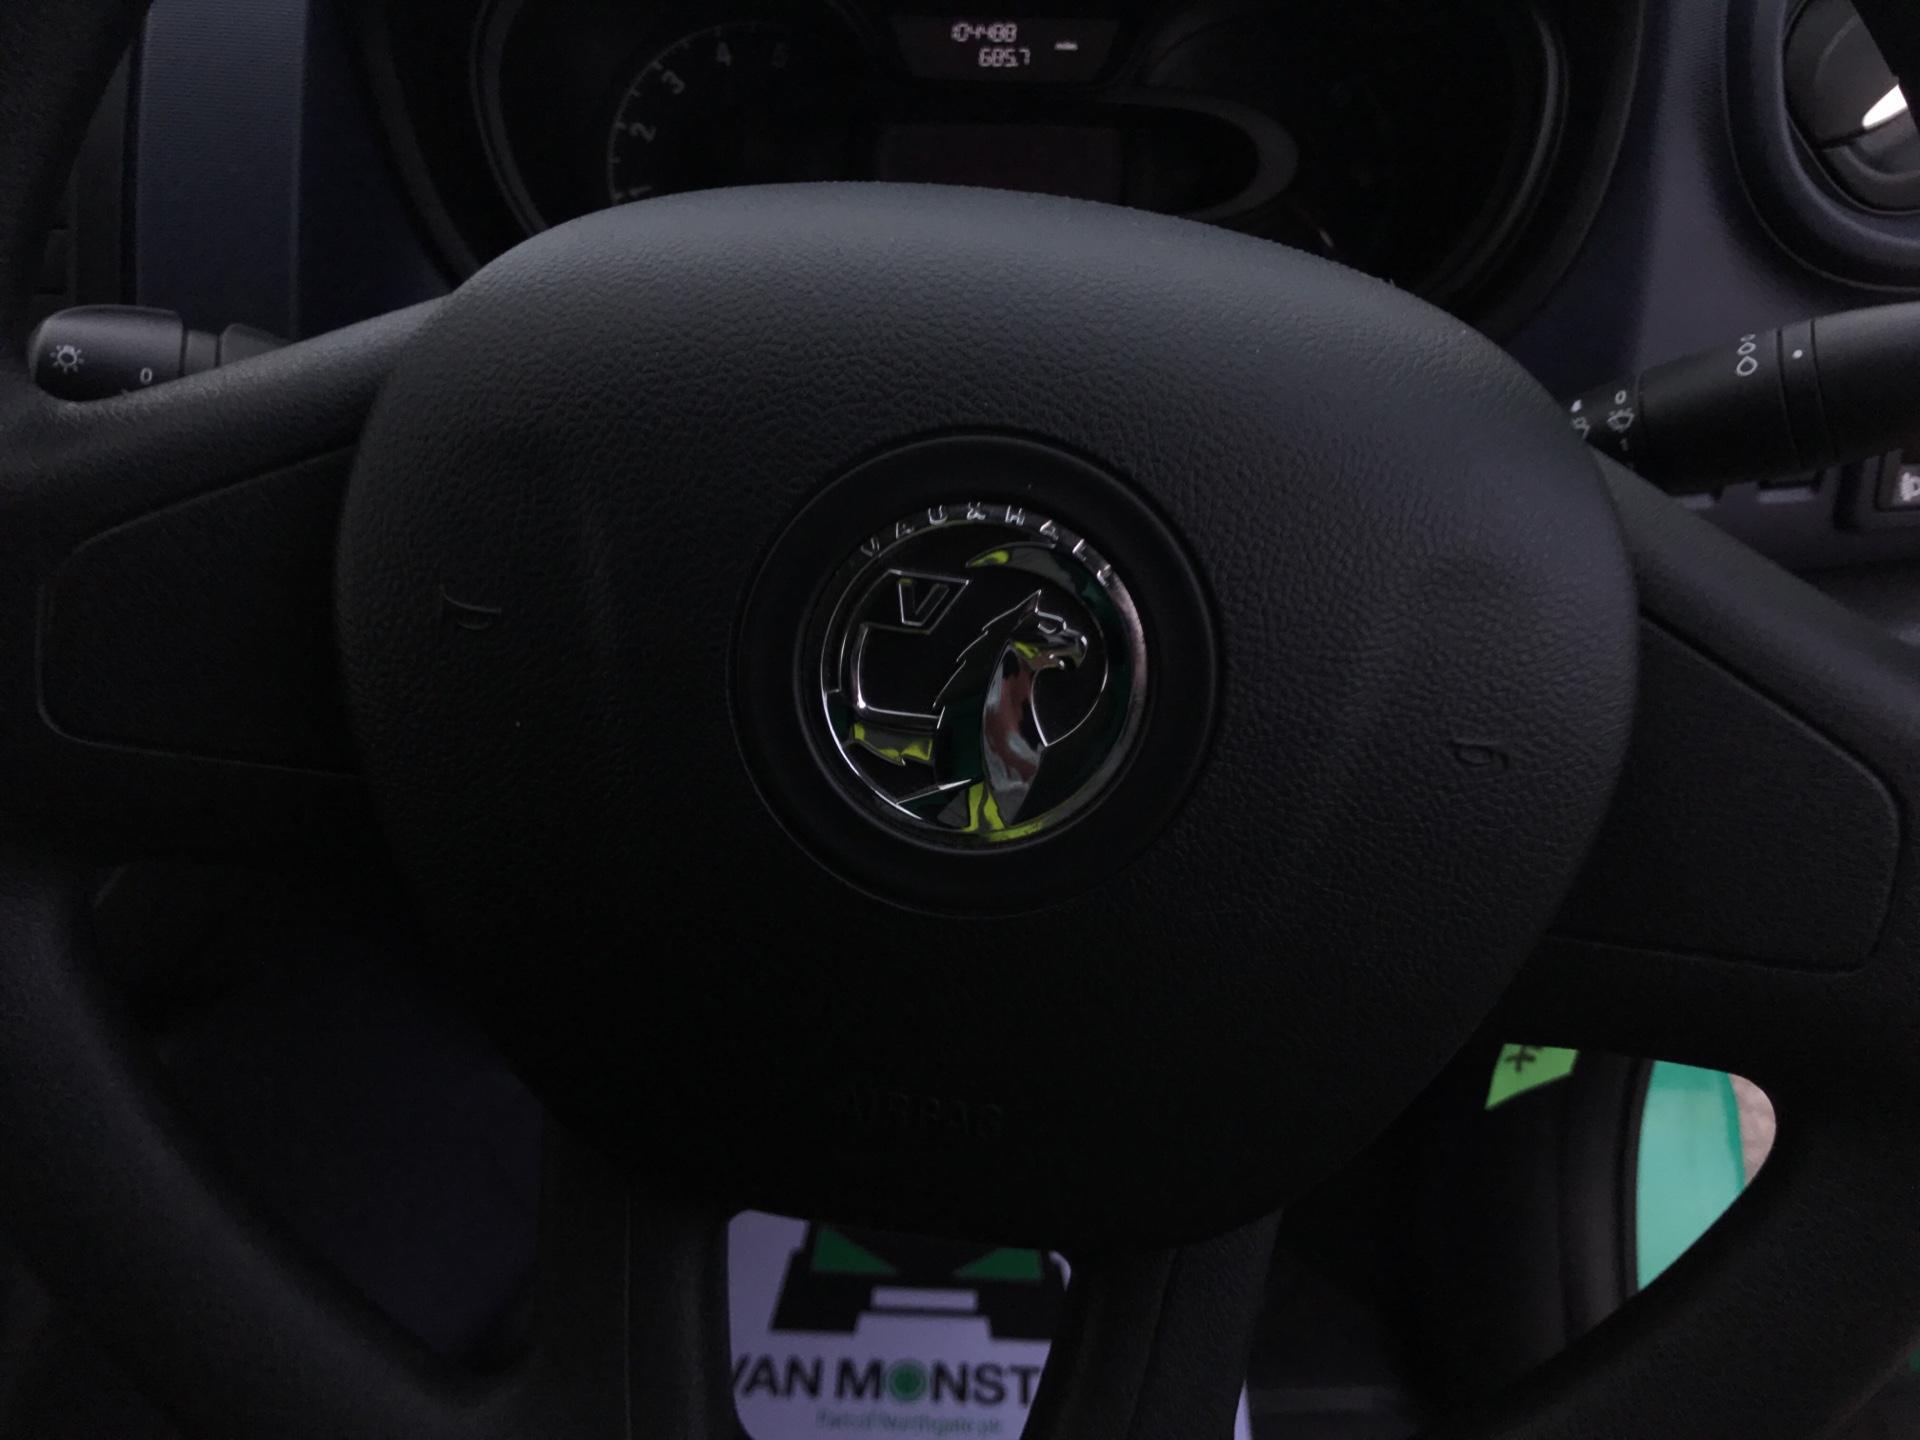 2017 Vauxhall Vivaro L2 H1 2900 1.6CDTI 95PS EURO 6 *VALUE RANGE VEHICLE CONDITION REFLECTED IN PRICE* (BK17OND) Image 12